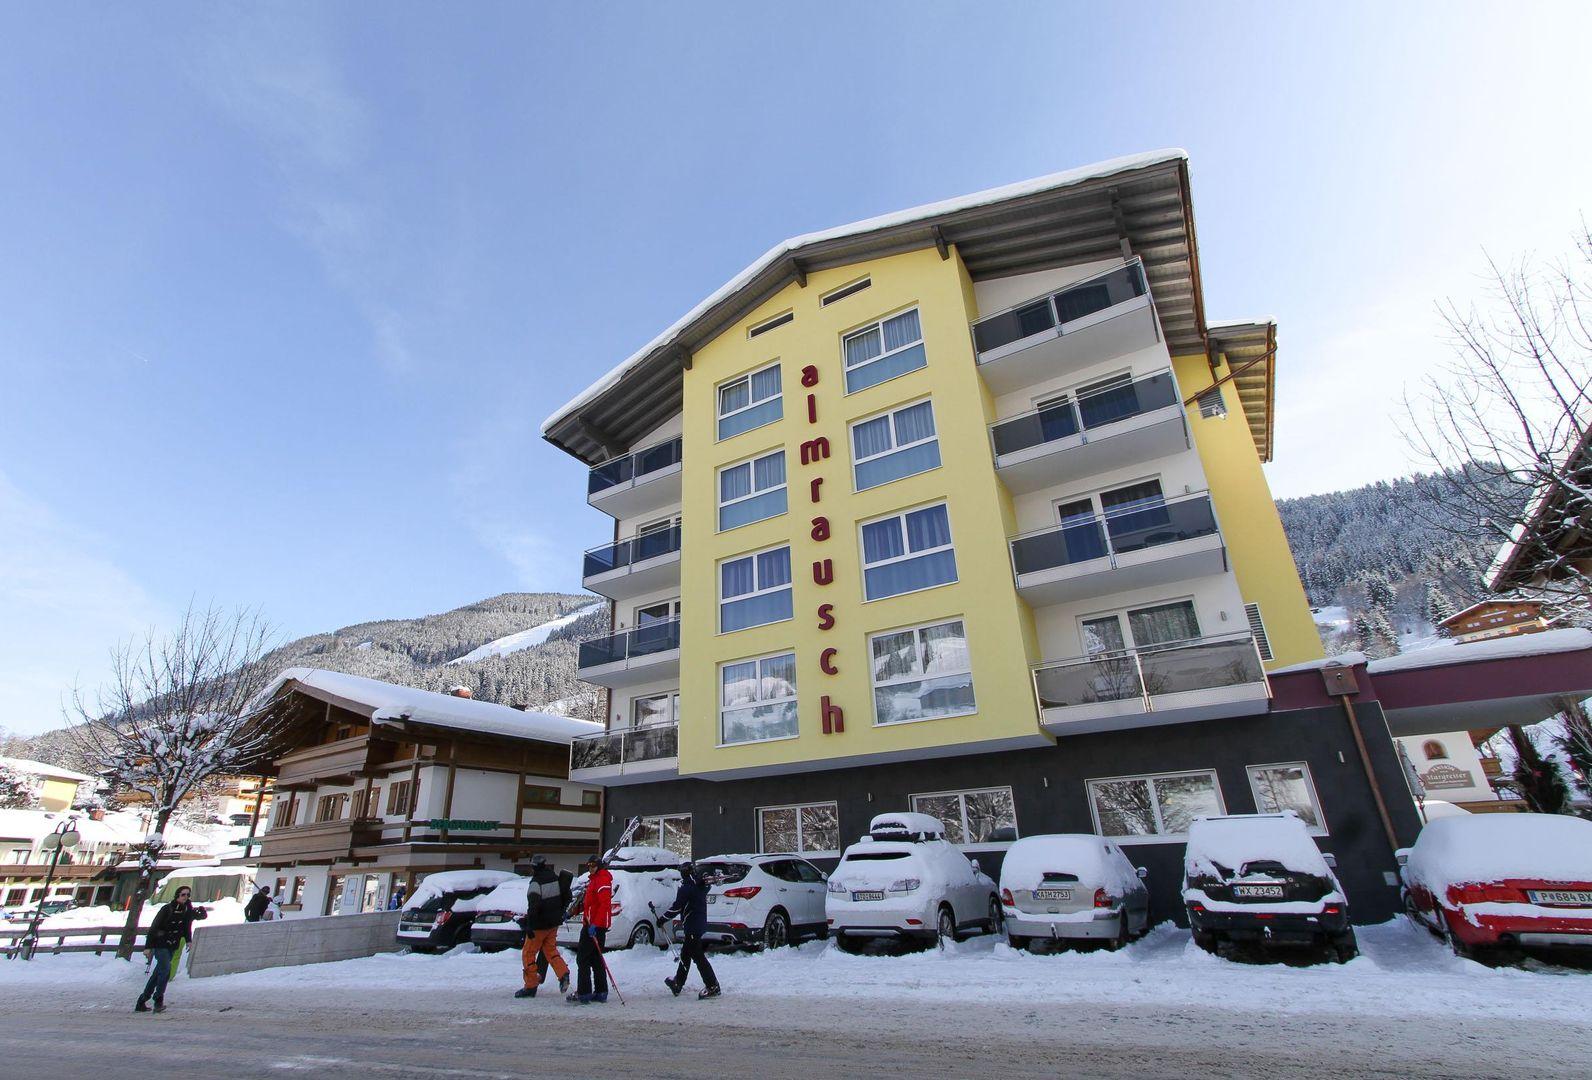 Hotel Almrausch - Slide 1